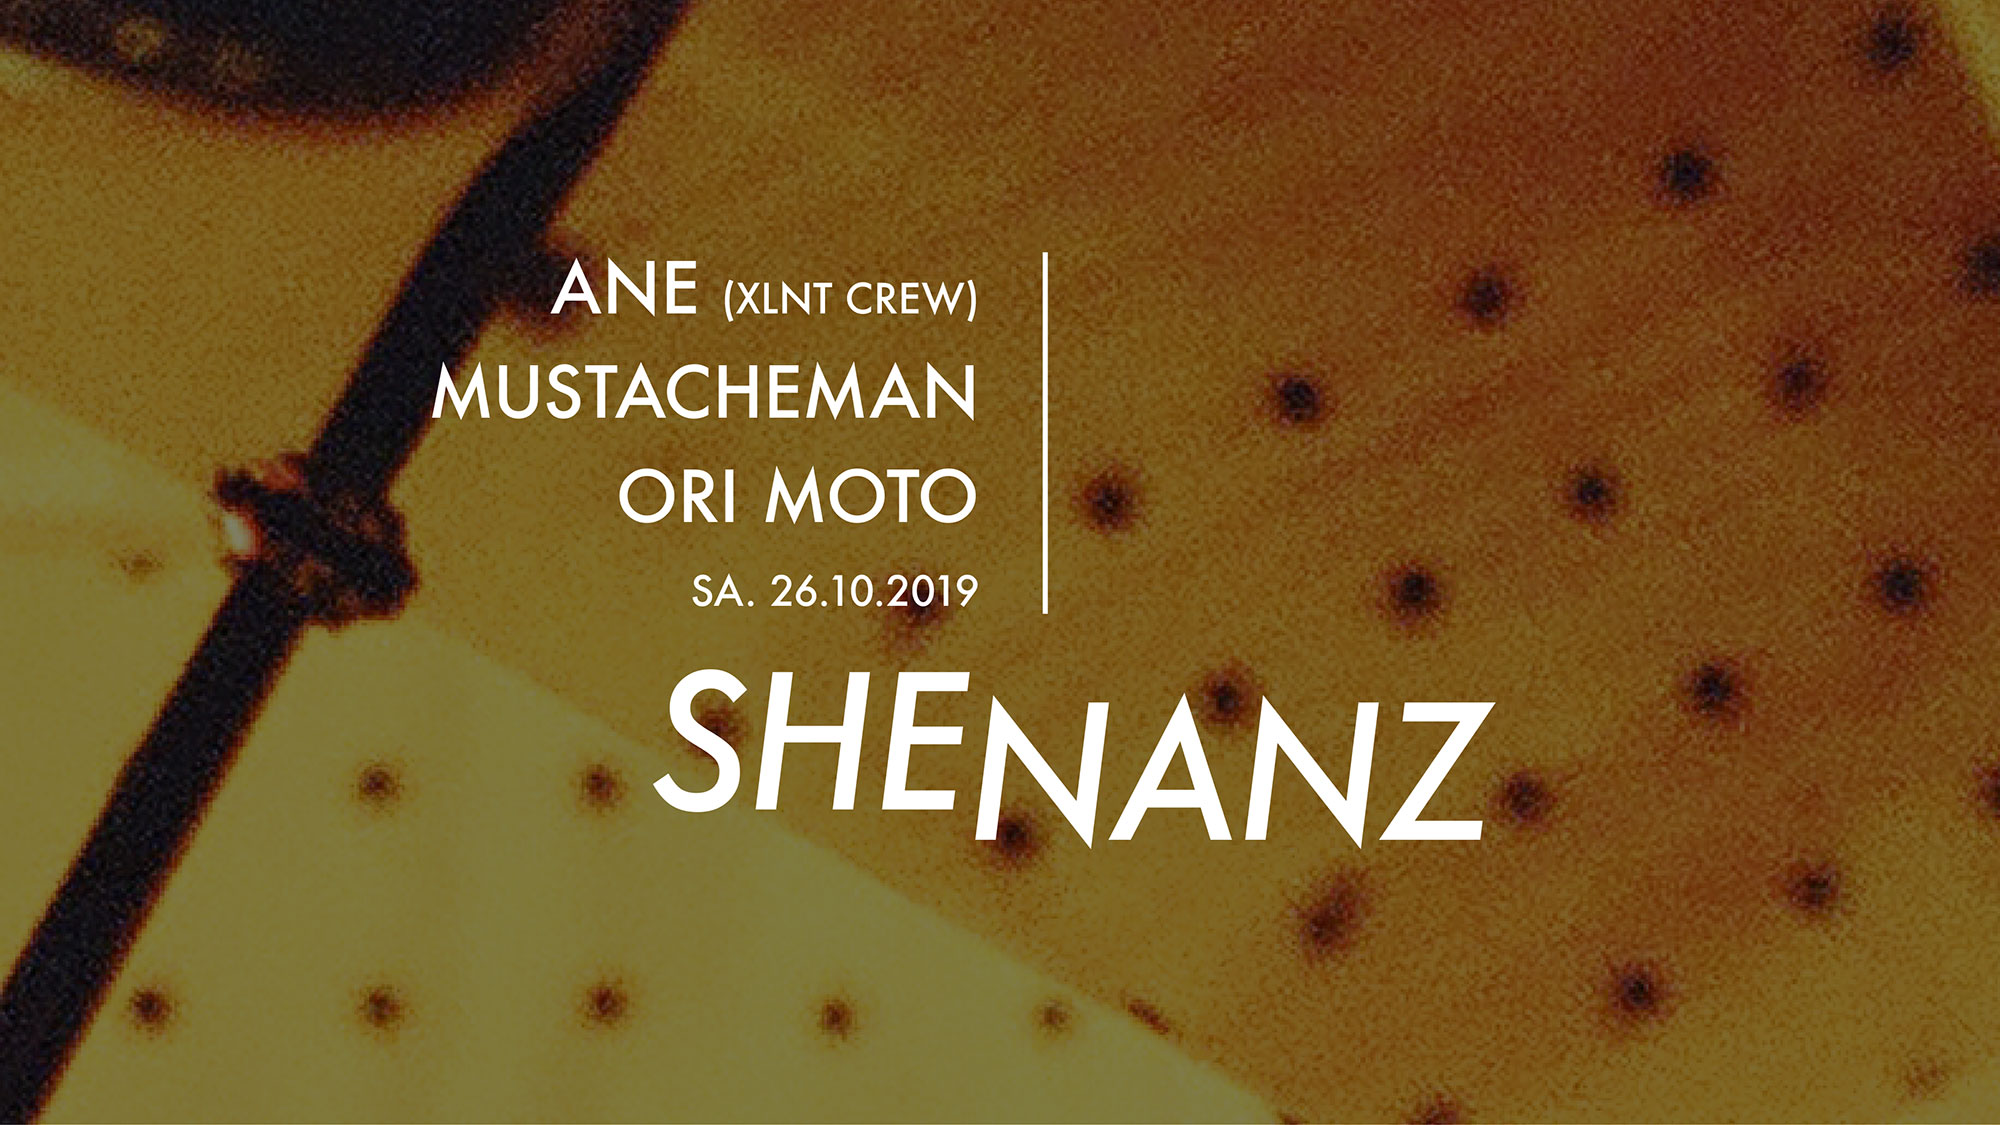 SHENANZ October 2019